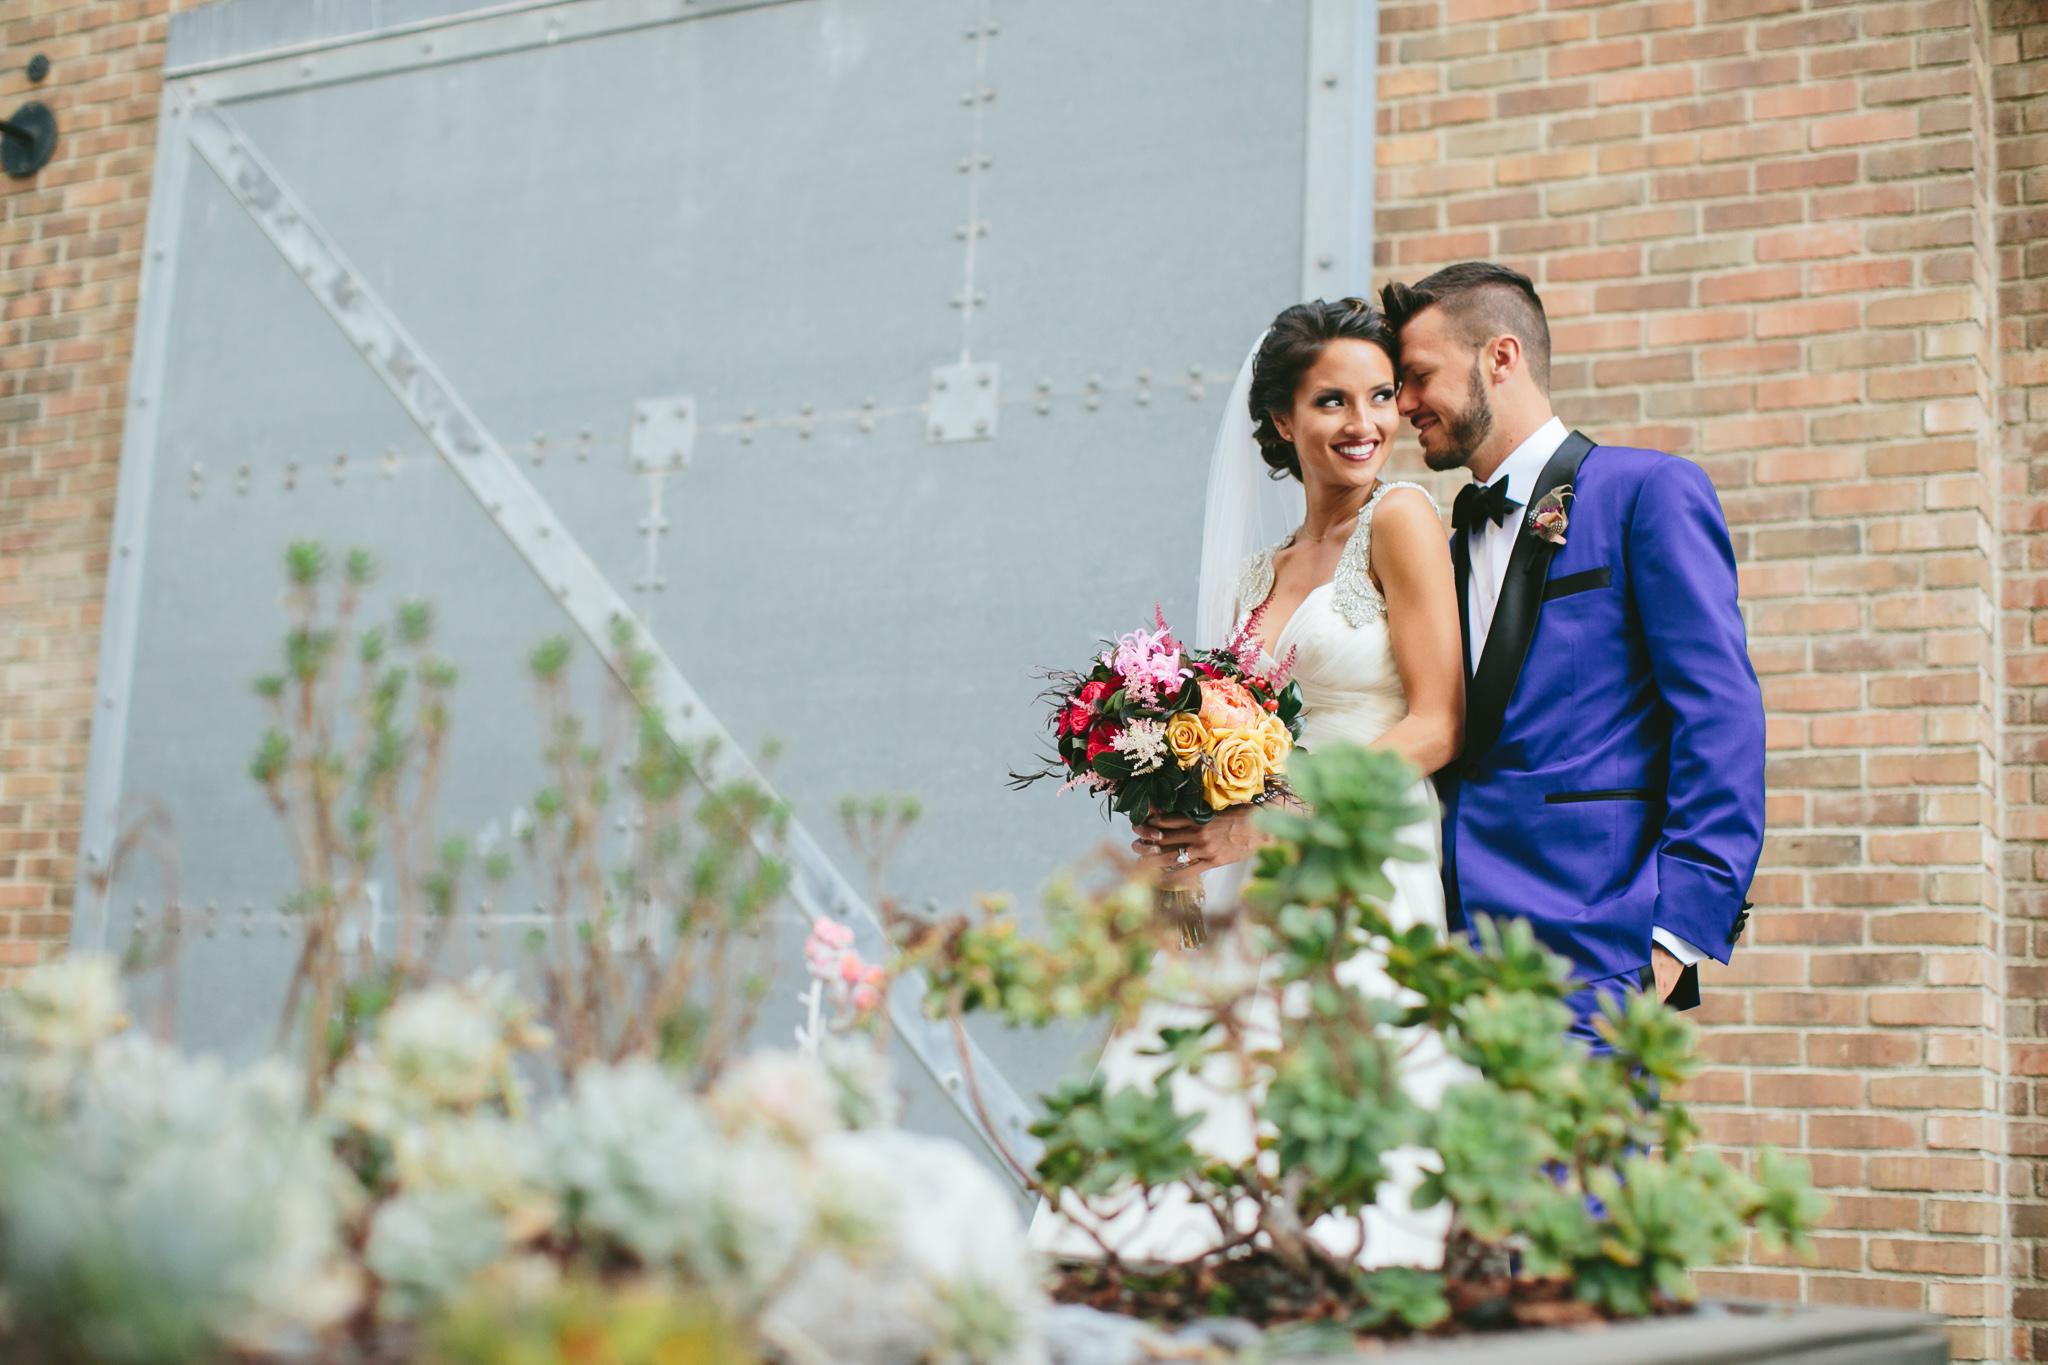 Brianna+Jeff-WEDDING_KellyBoitanoPhotography20151219_0050